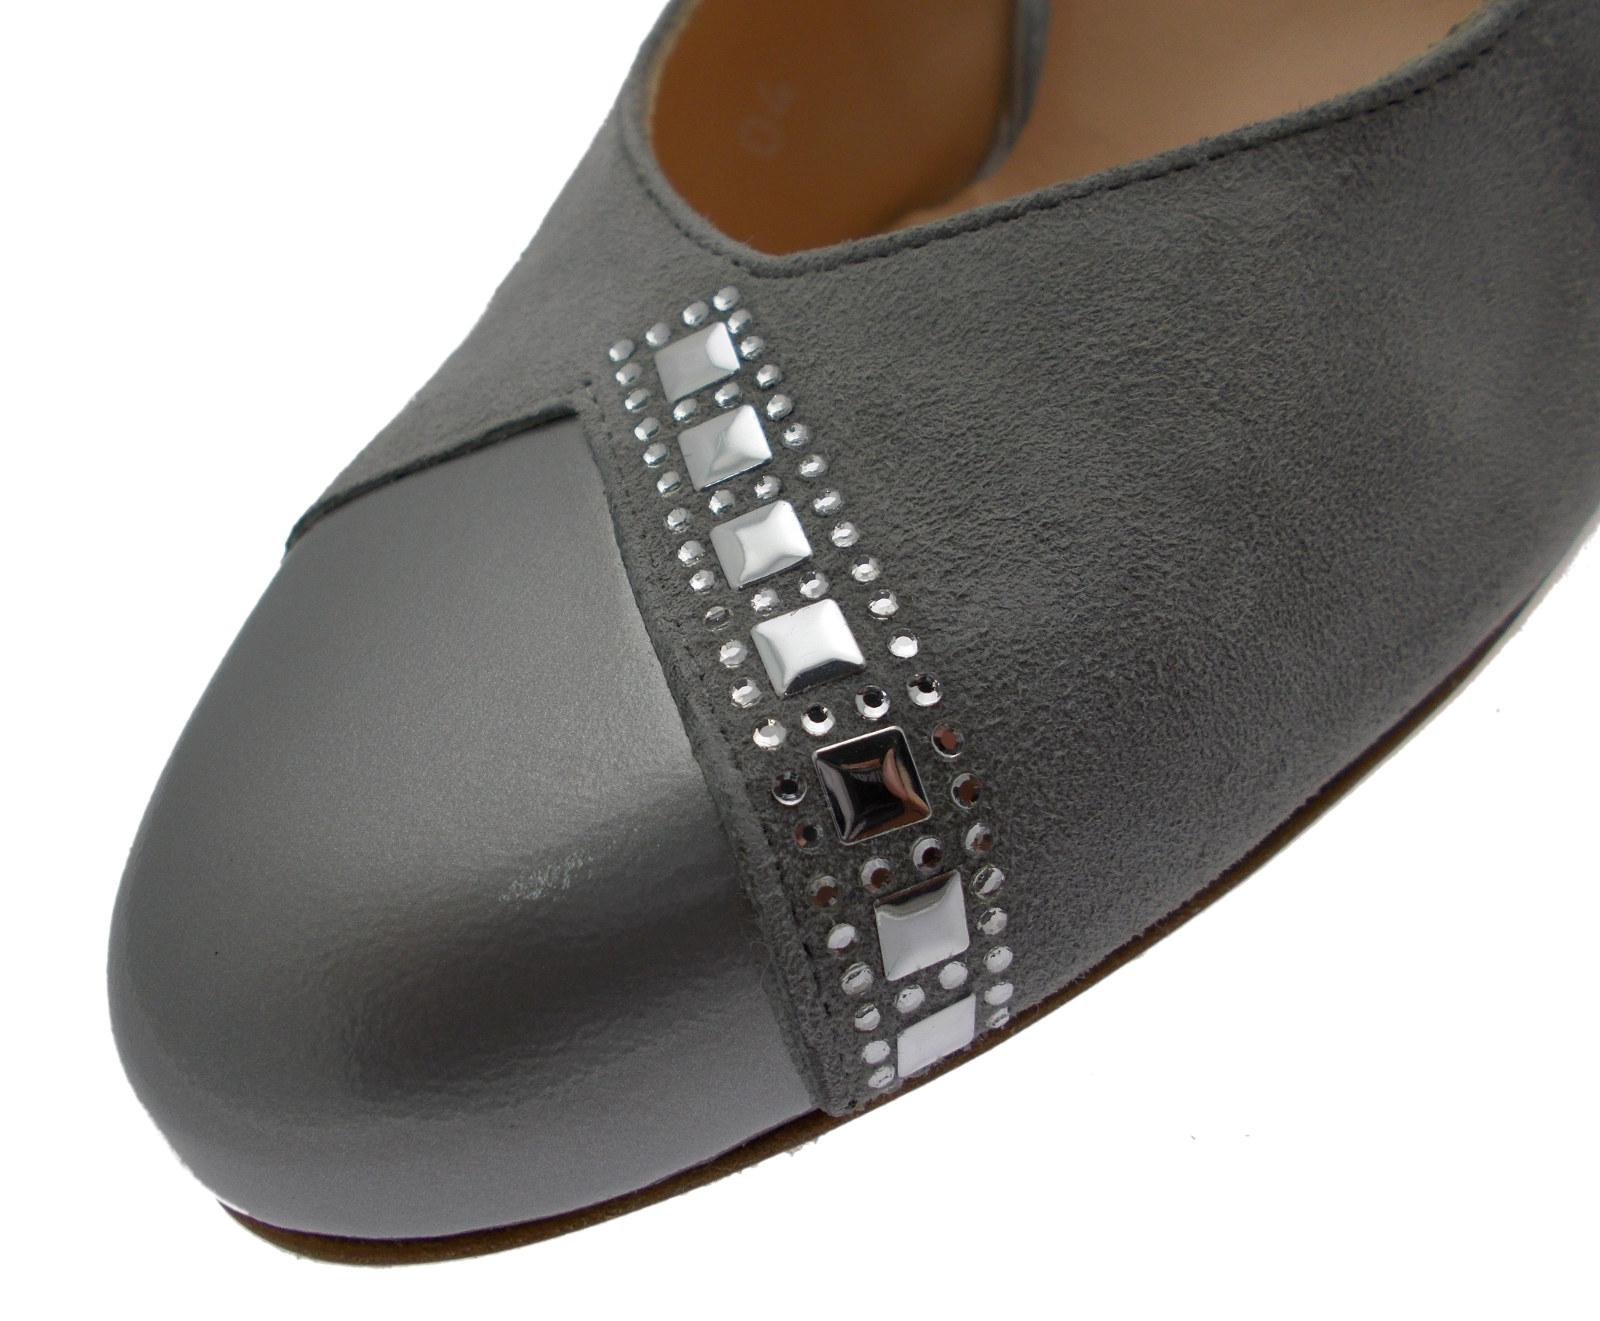 sandalo chiuso decoltè camoscio grigio argento acciaio Melluso